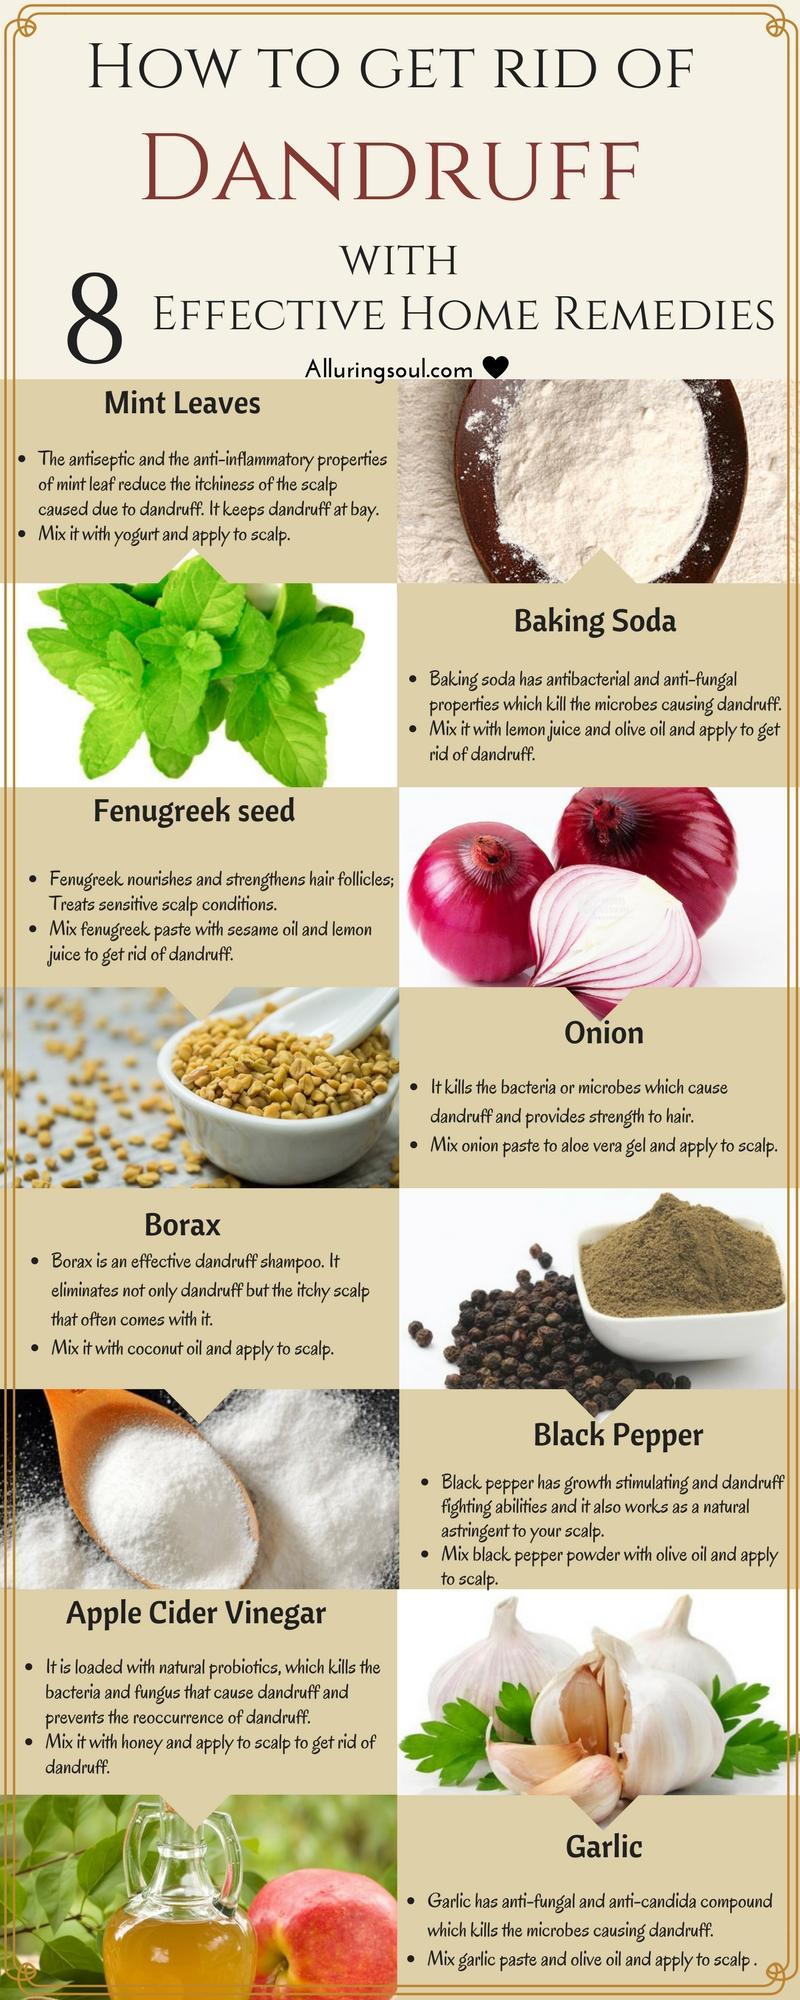 dandruff-home-remedies